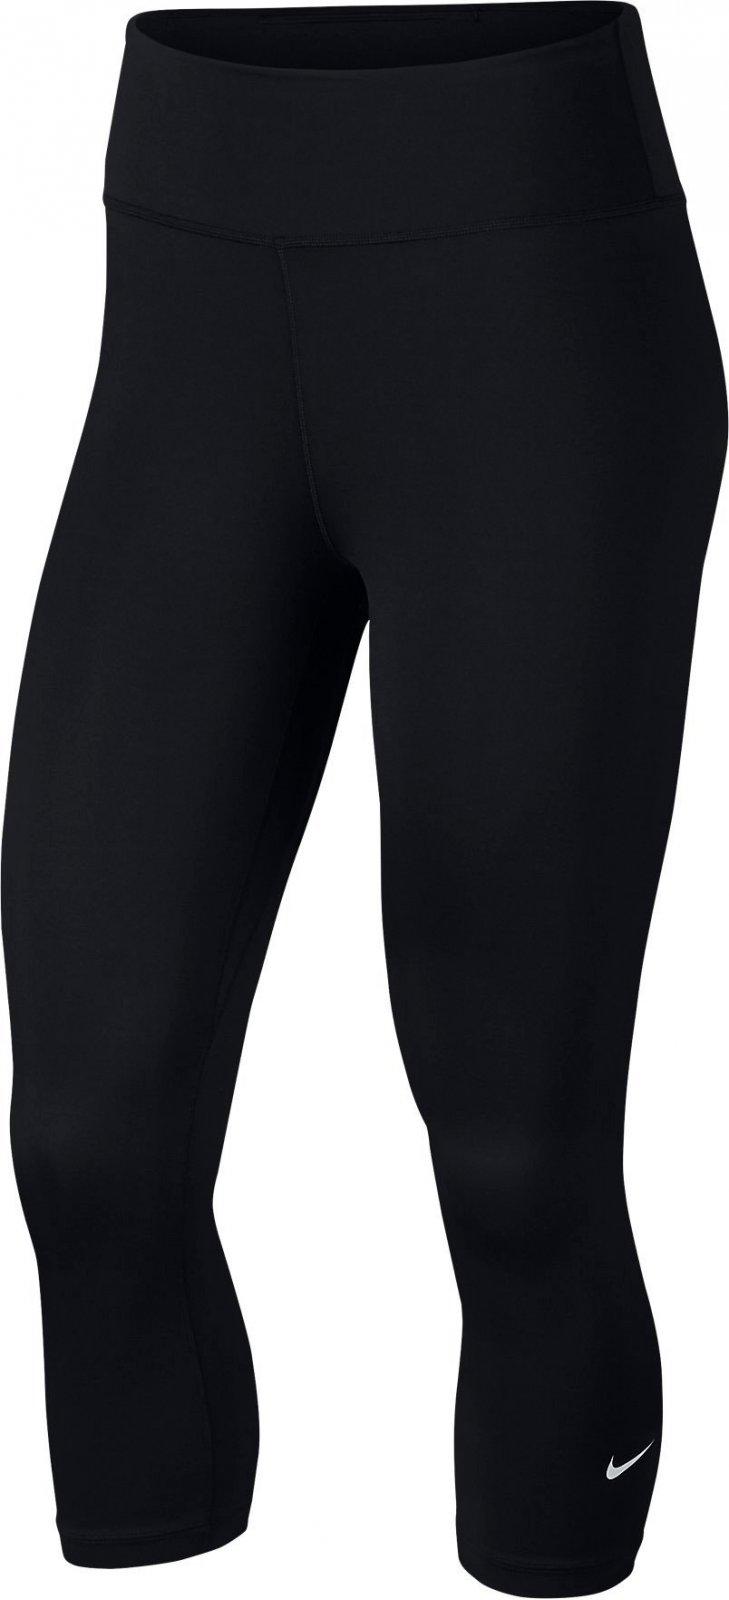 9a244be76493 Nike W One Tight Cpri BV0003-010 černé XS od 764 Kč